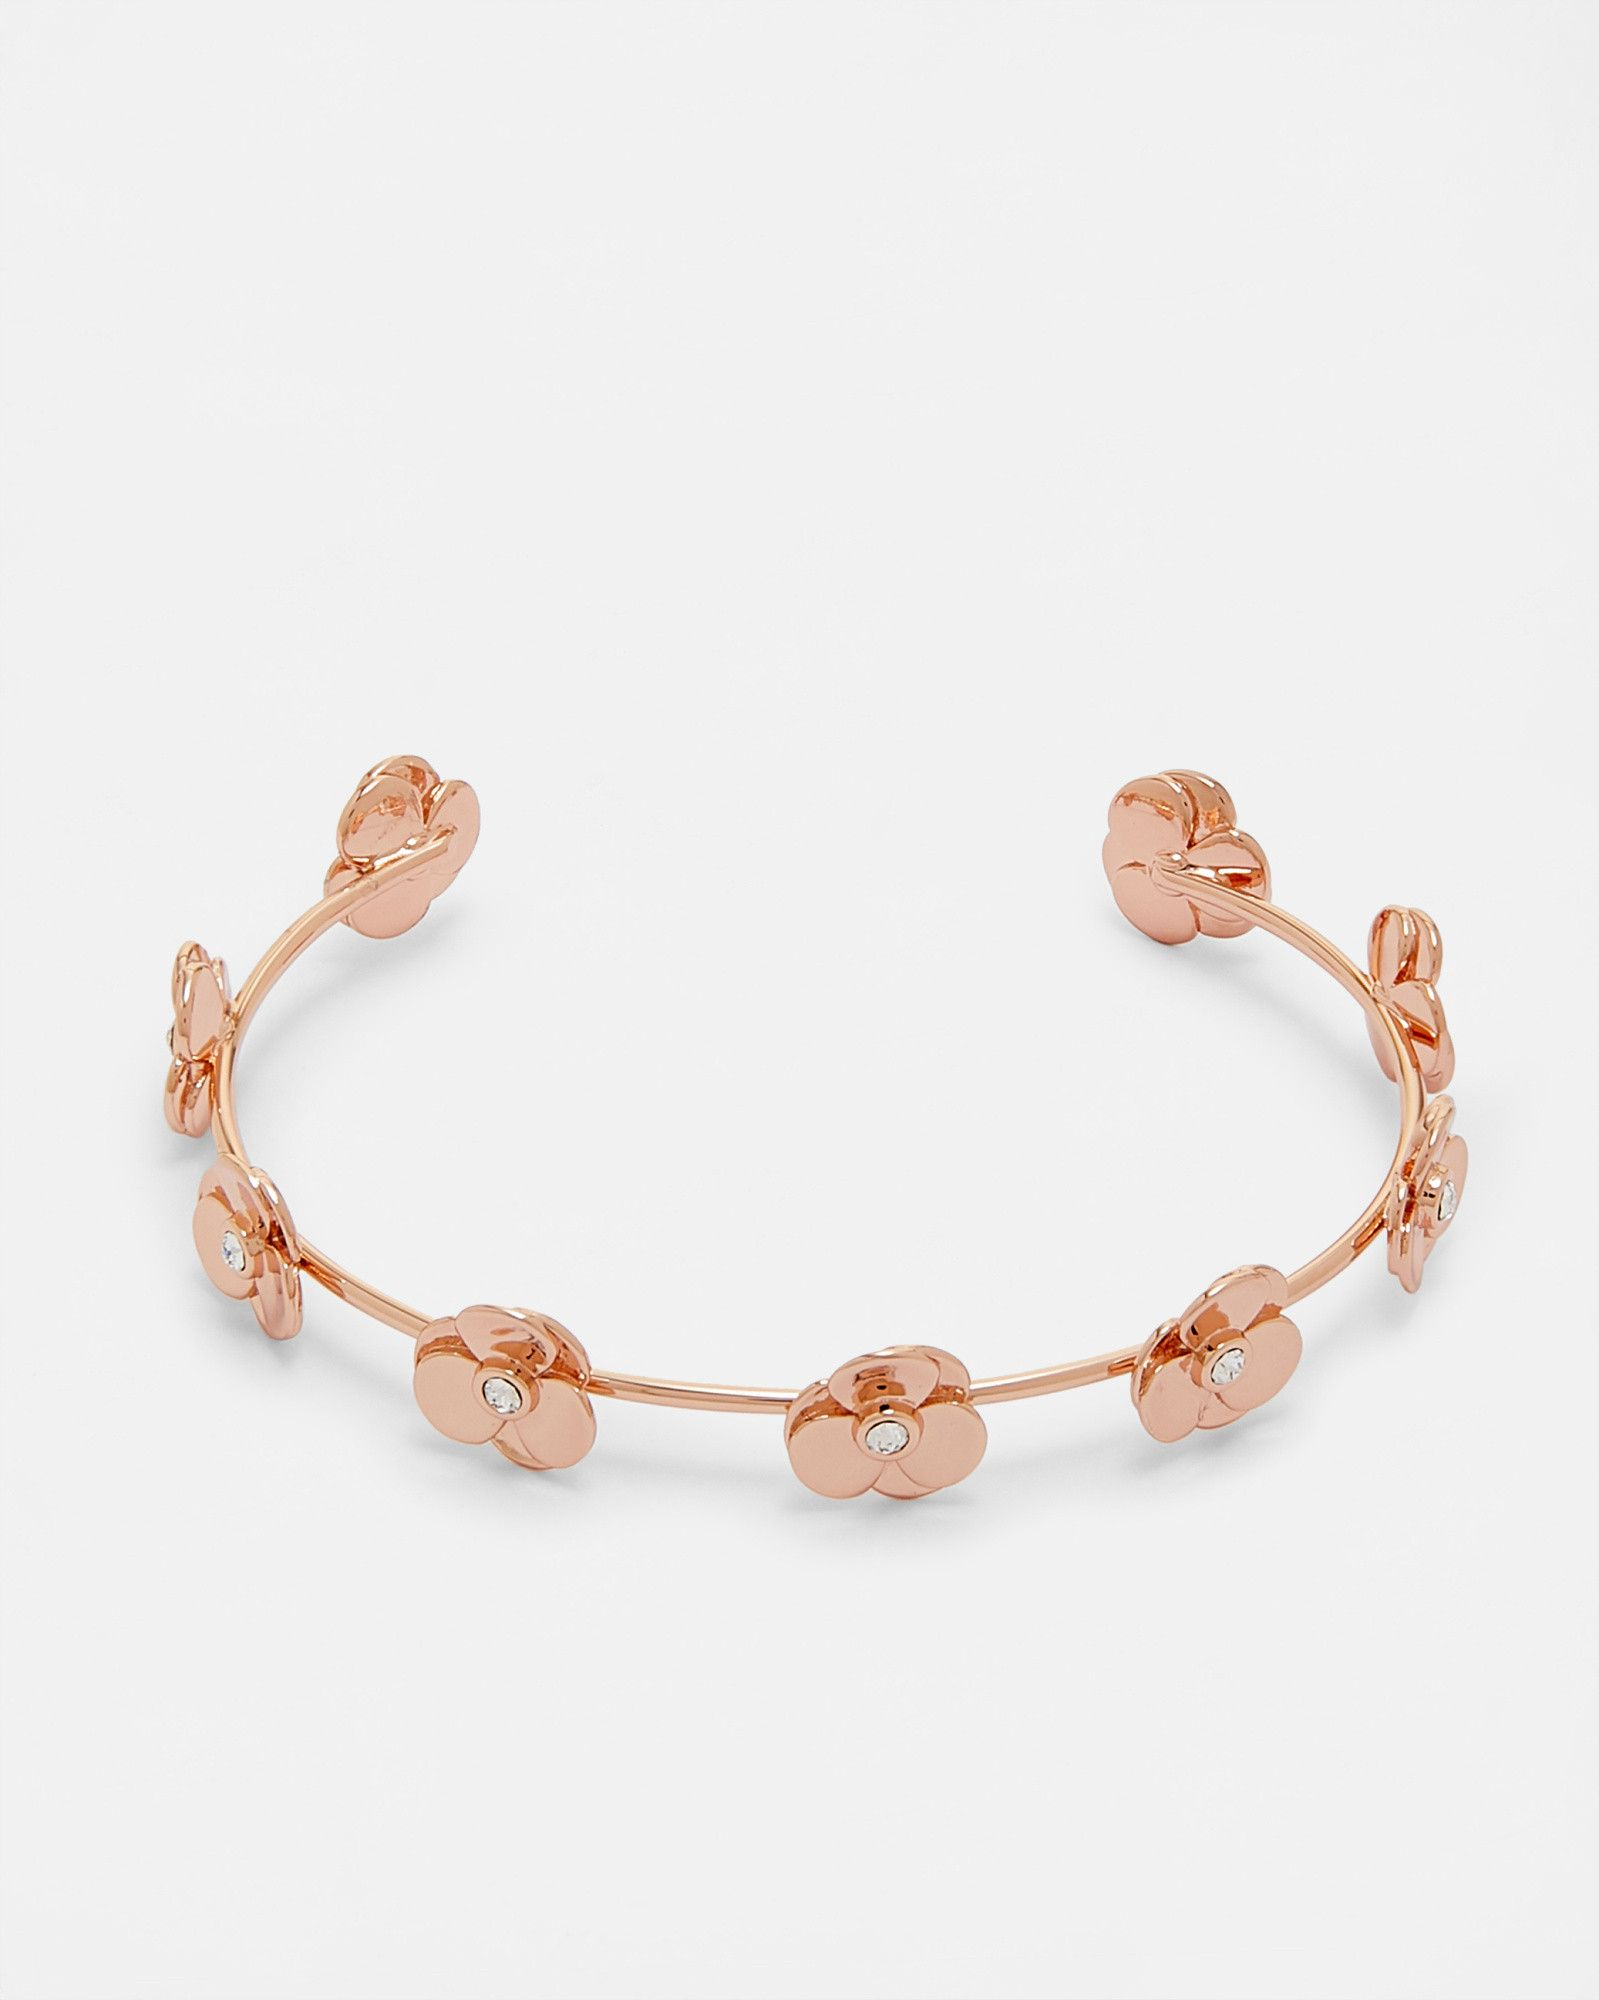 Pressed Flower Swarovski Crystal Cuff Rose Gold Jewellery Ted Baker Uk